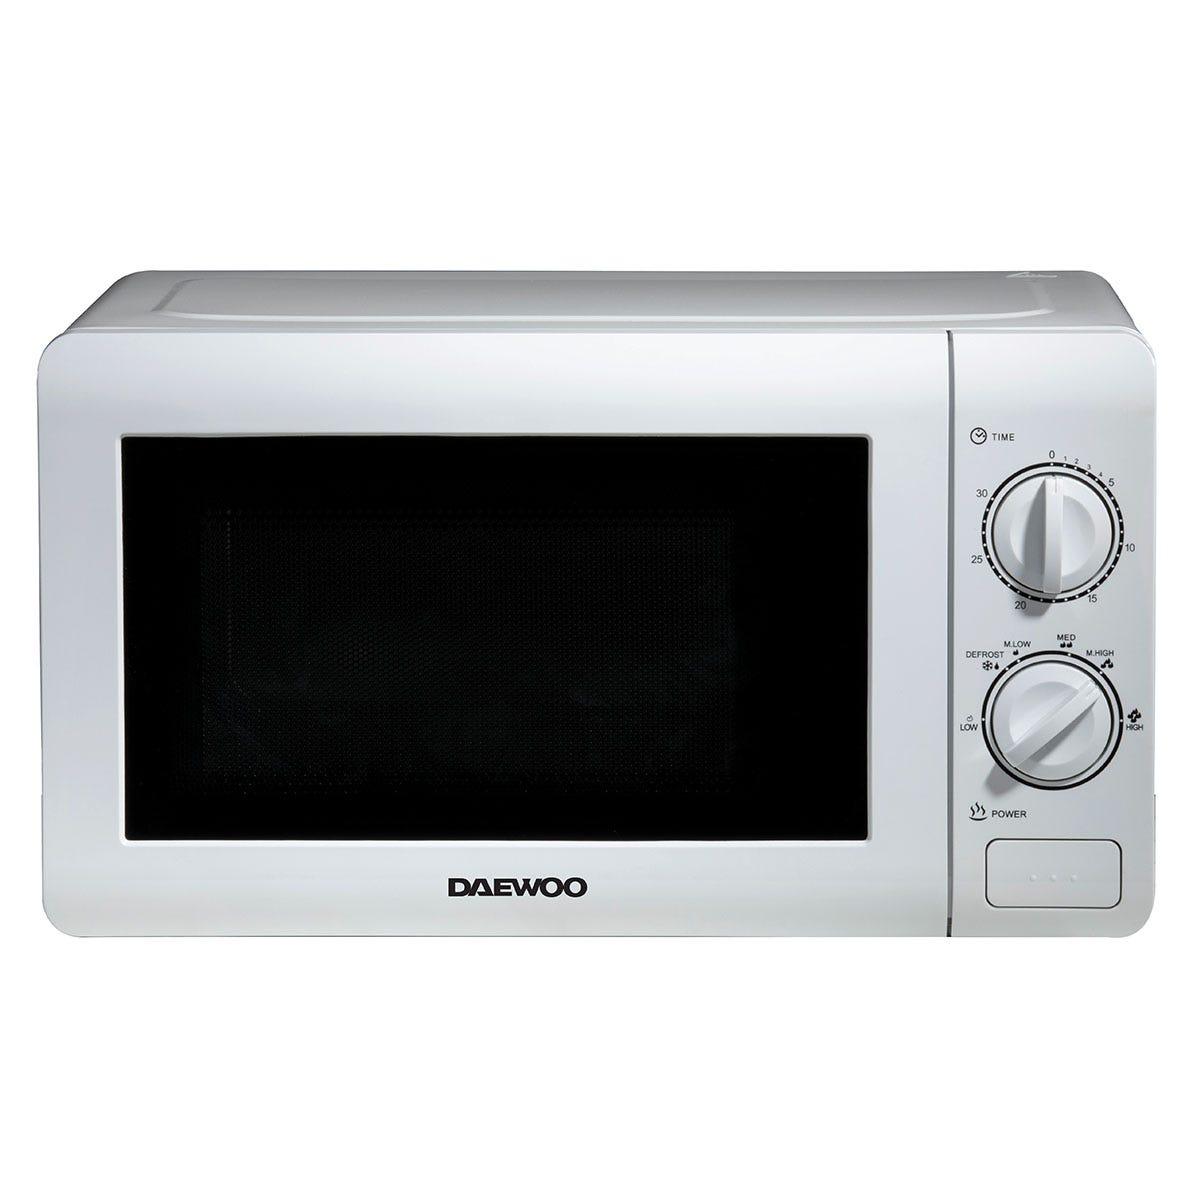 Daewoo SDA2075GE 20L 800W Manual Microwave - White